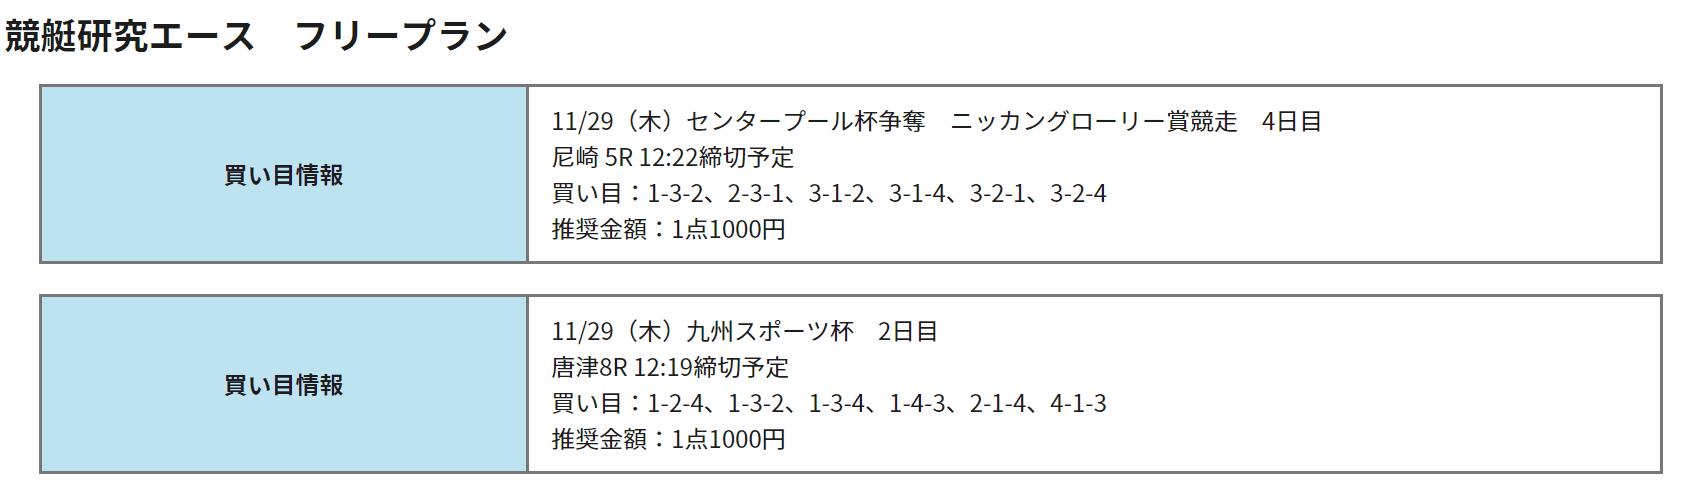 競艇研究エース 無料情報 買い目